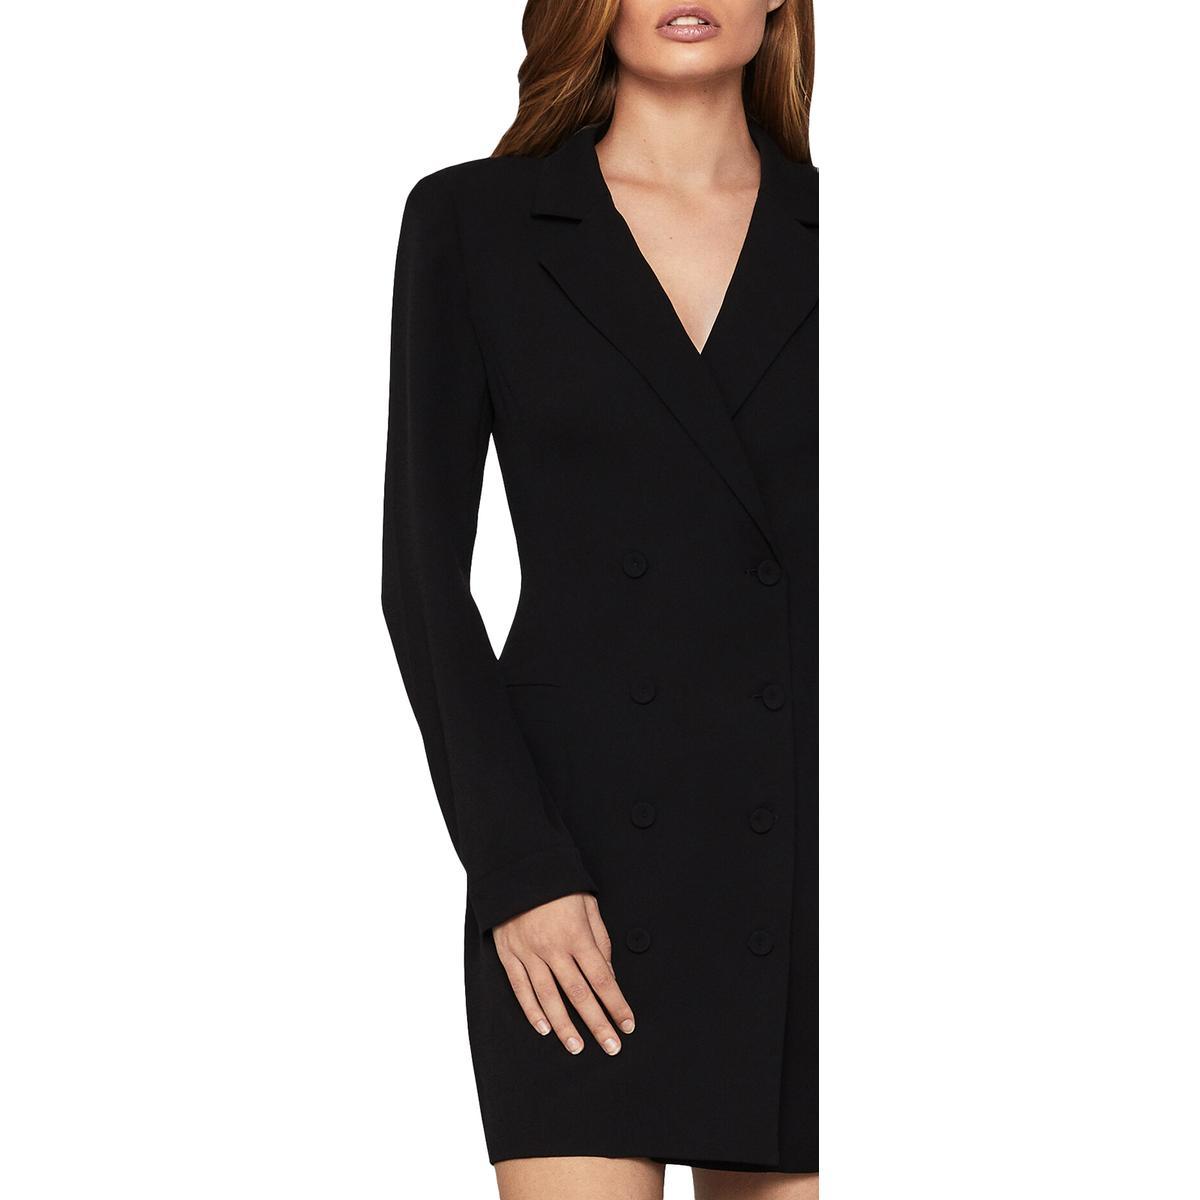 BCBG Max Azria Womens Eve Blazer Sheath Mini Jacket Dress Tunic BHFO 0141